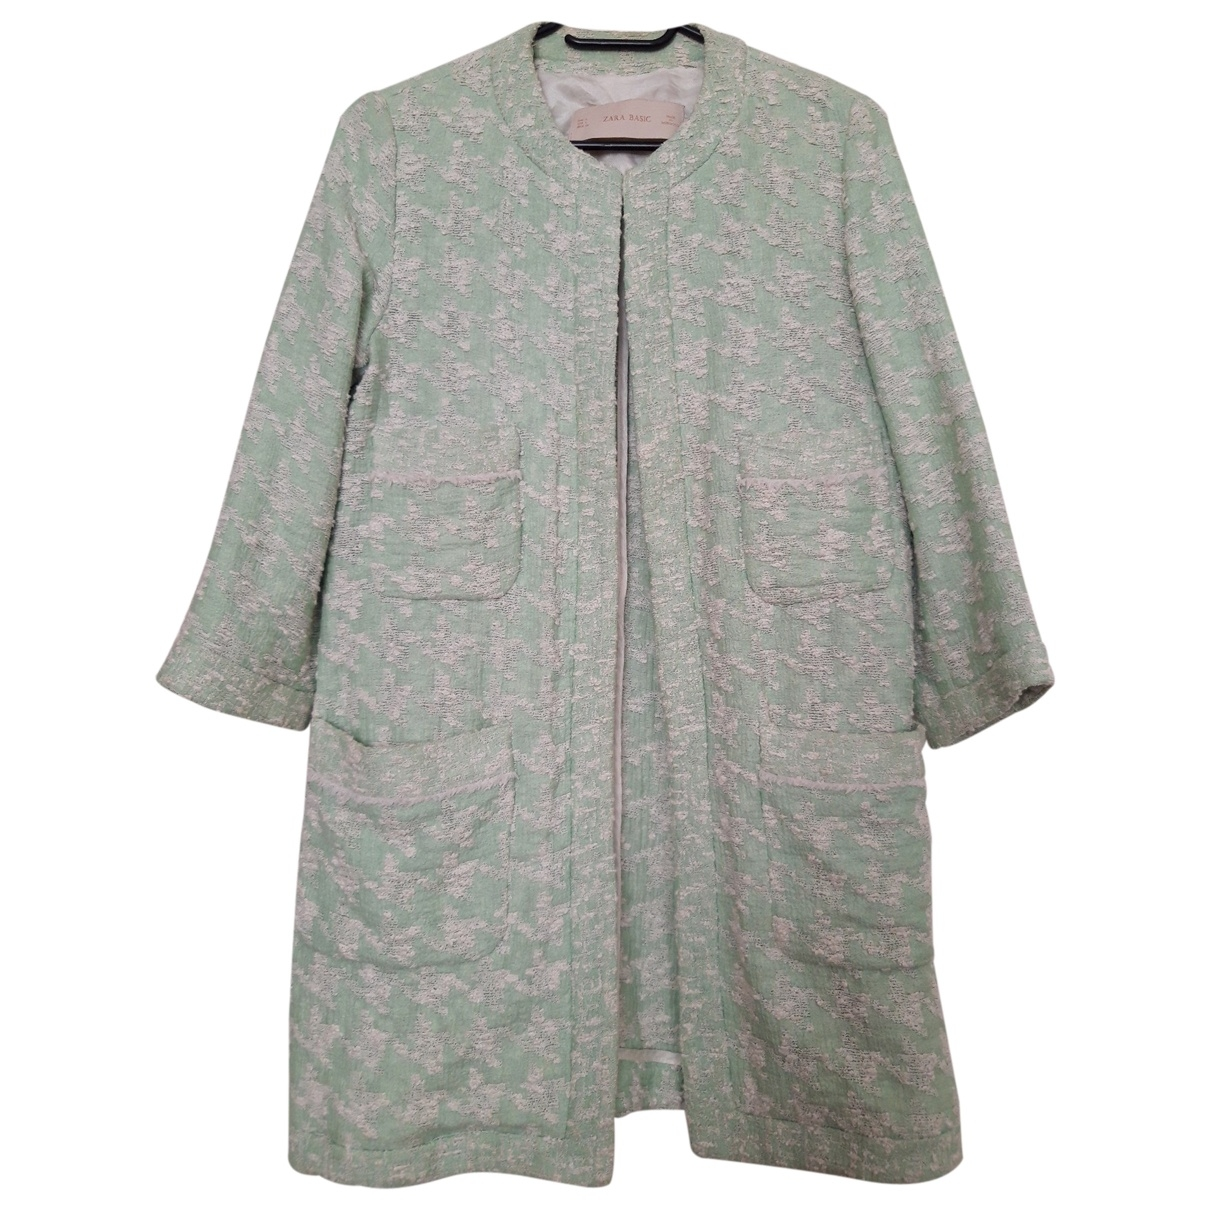 Zara \N Green Cotton coat for Women L International